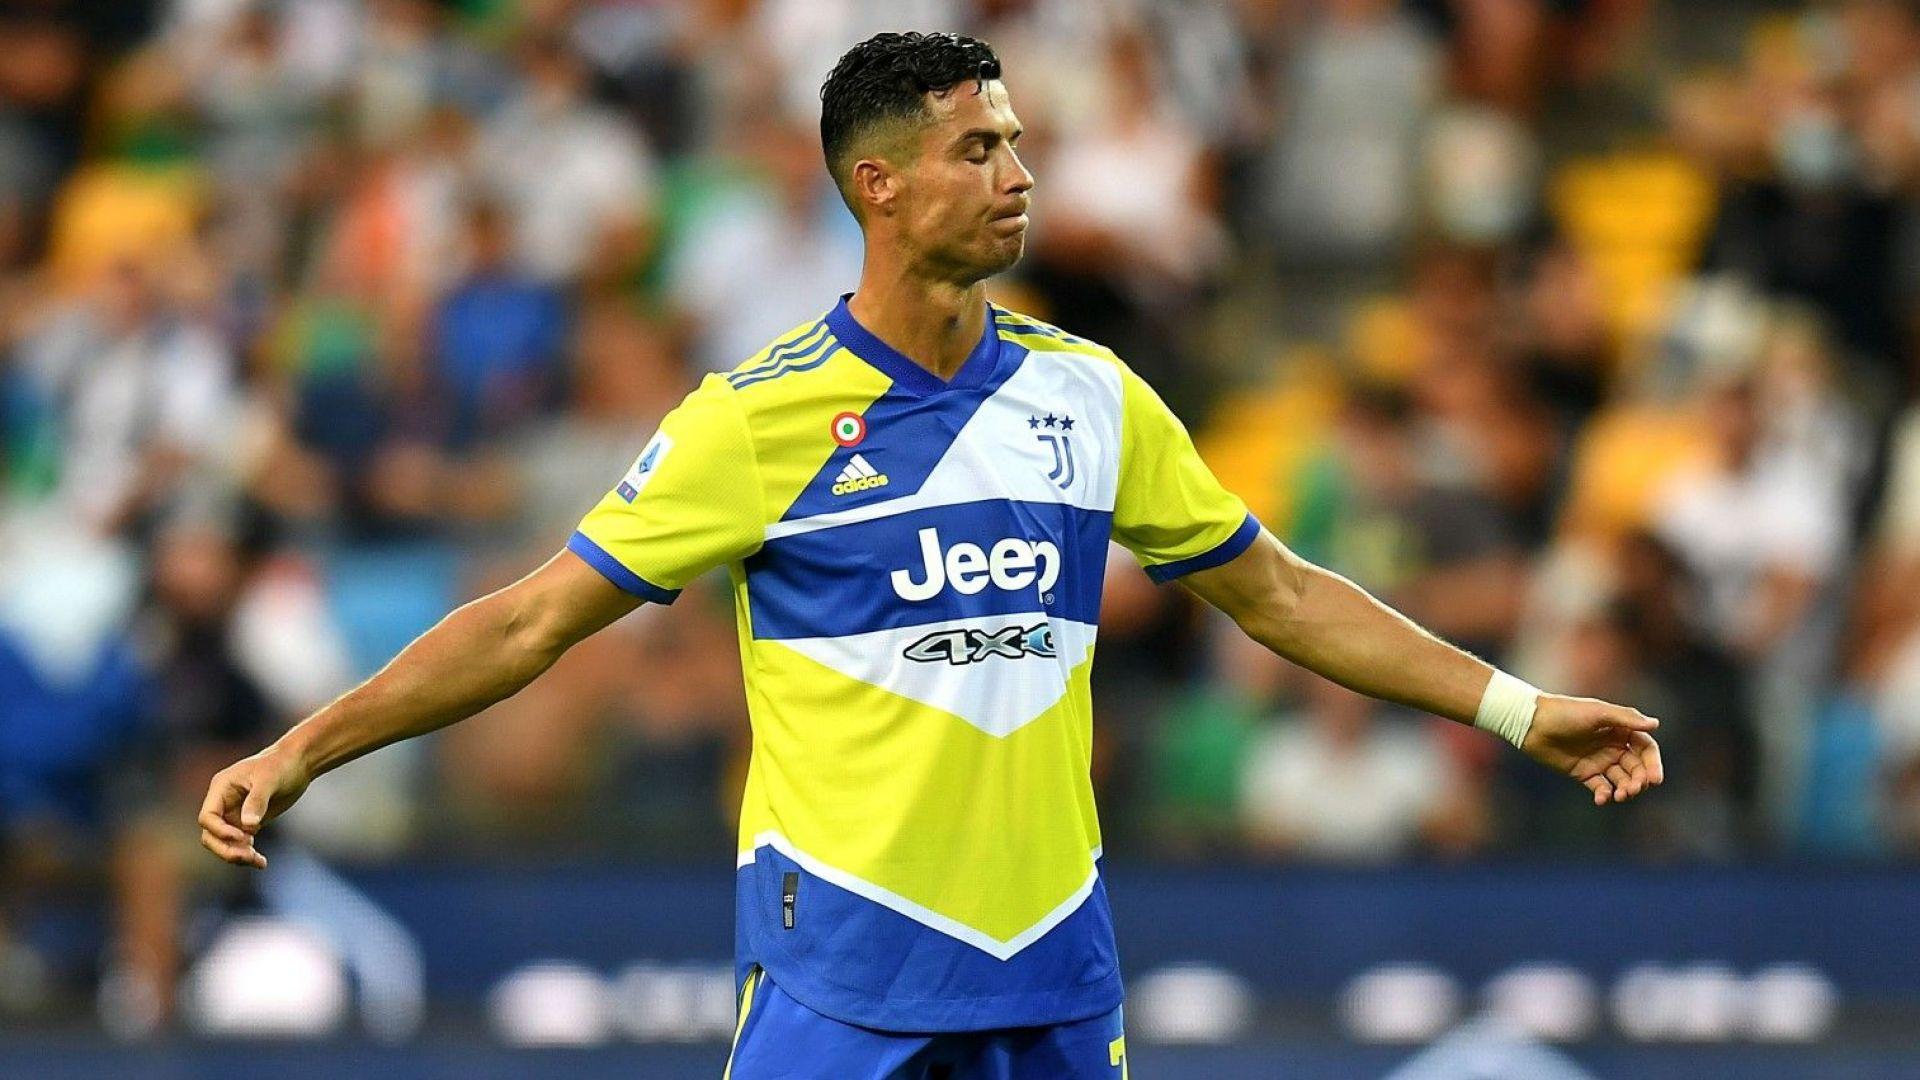 Защо Роналдо бе резерва в Удине?